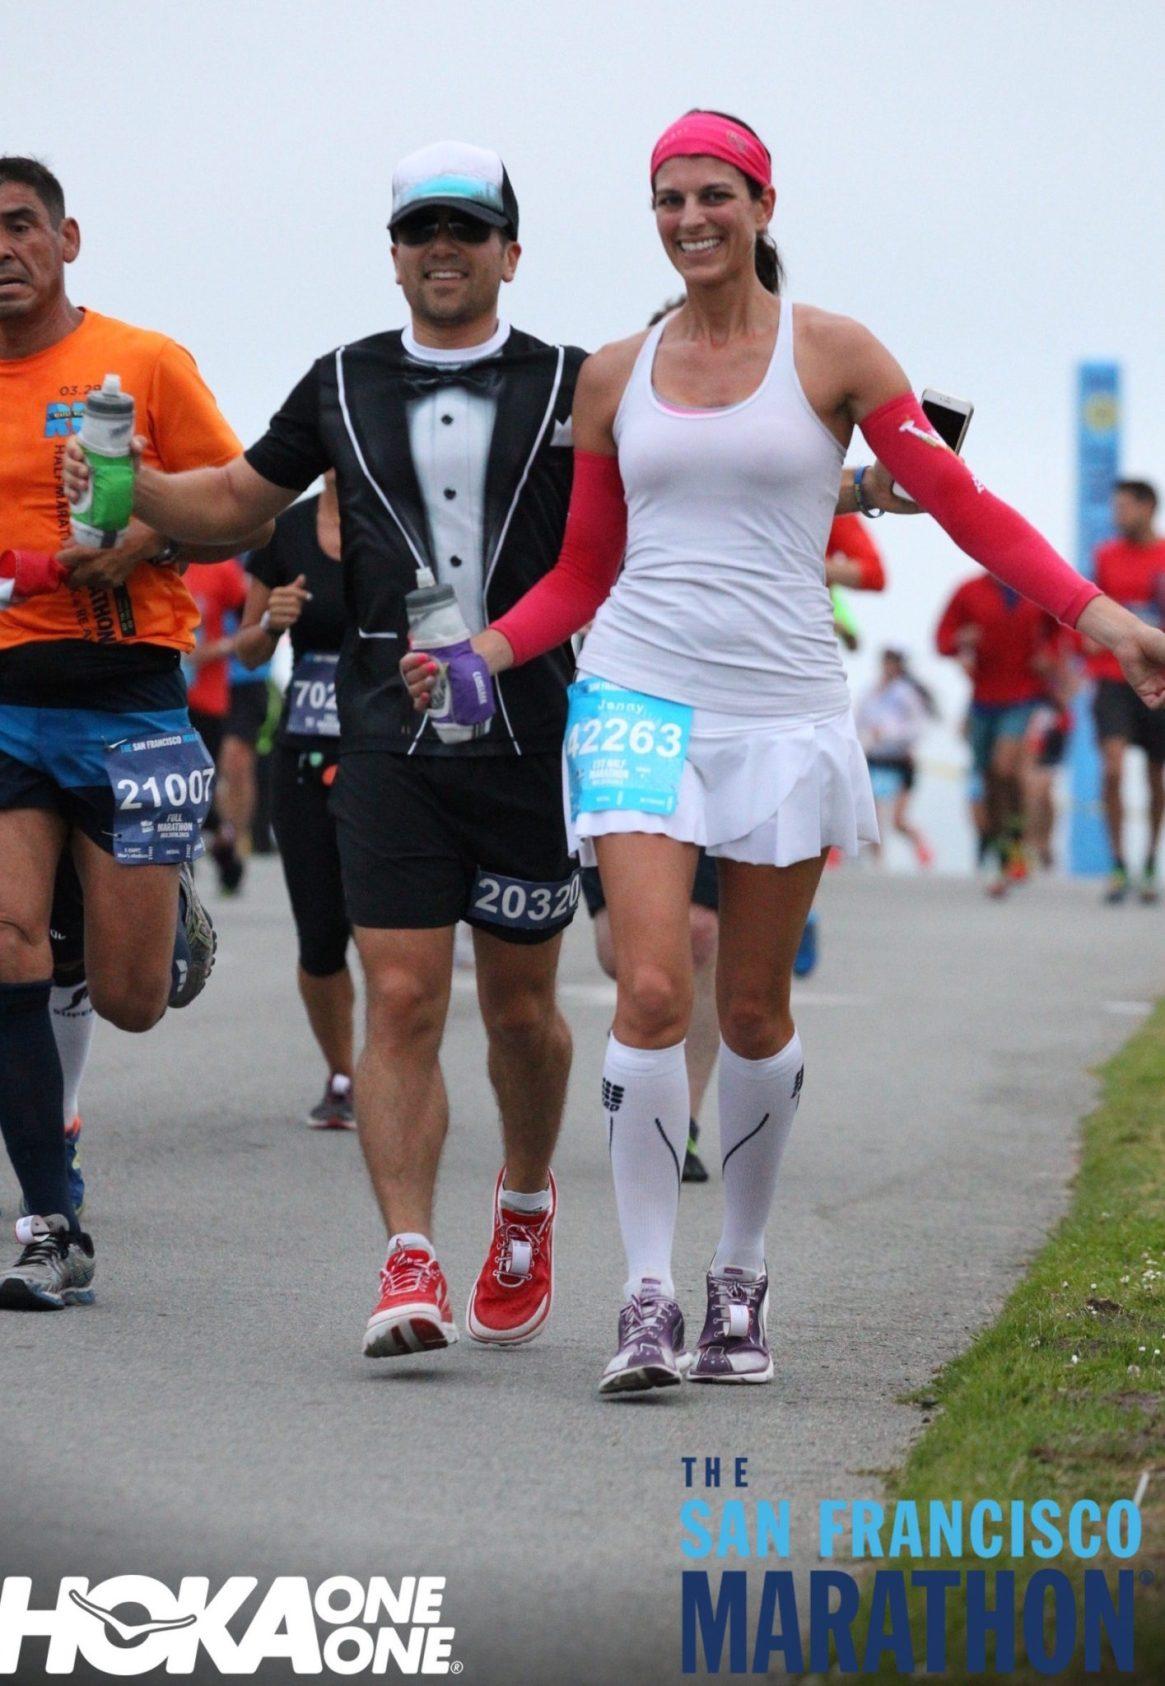 SF Marathon, Chrissy Field, 1st Half Marathon, Lululemon, Buff USA